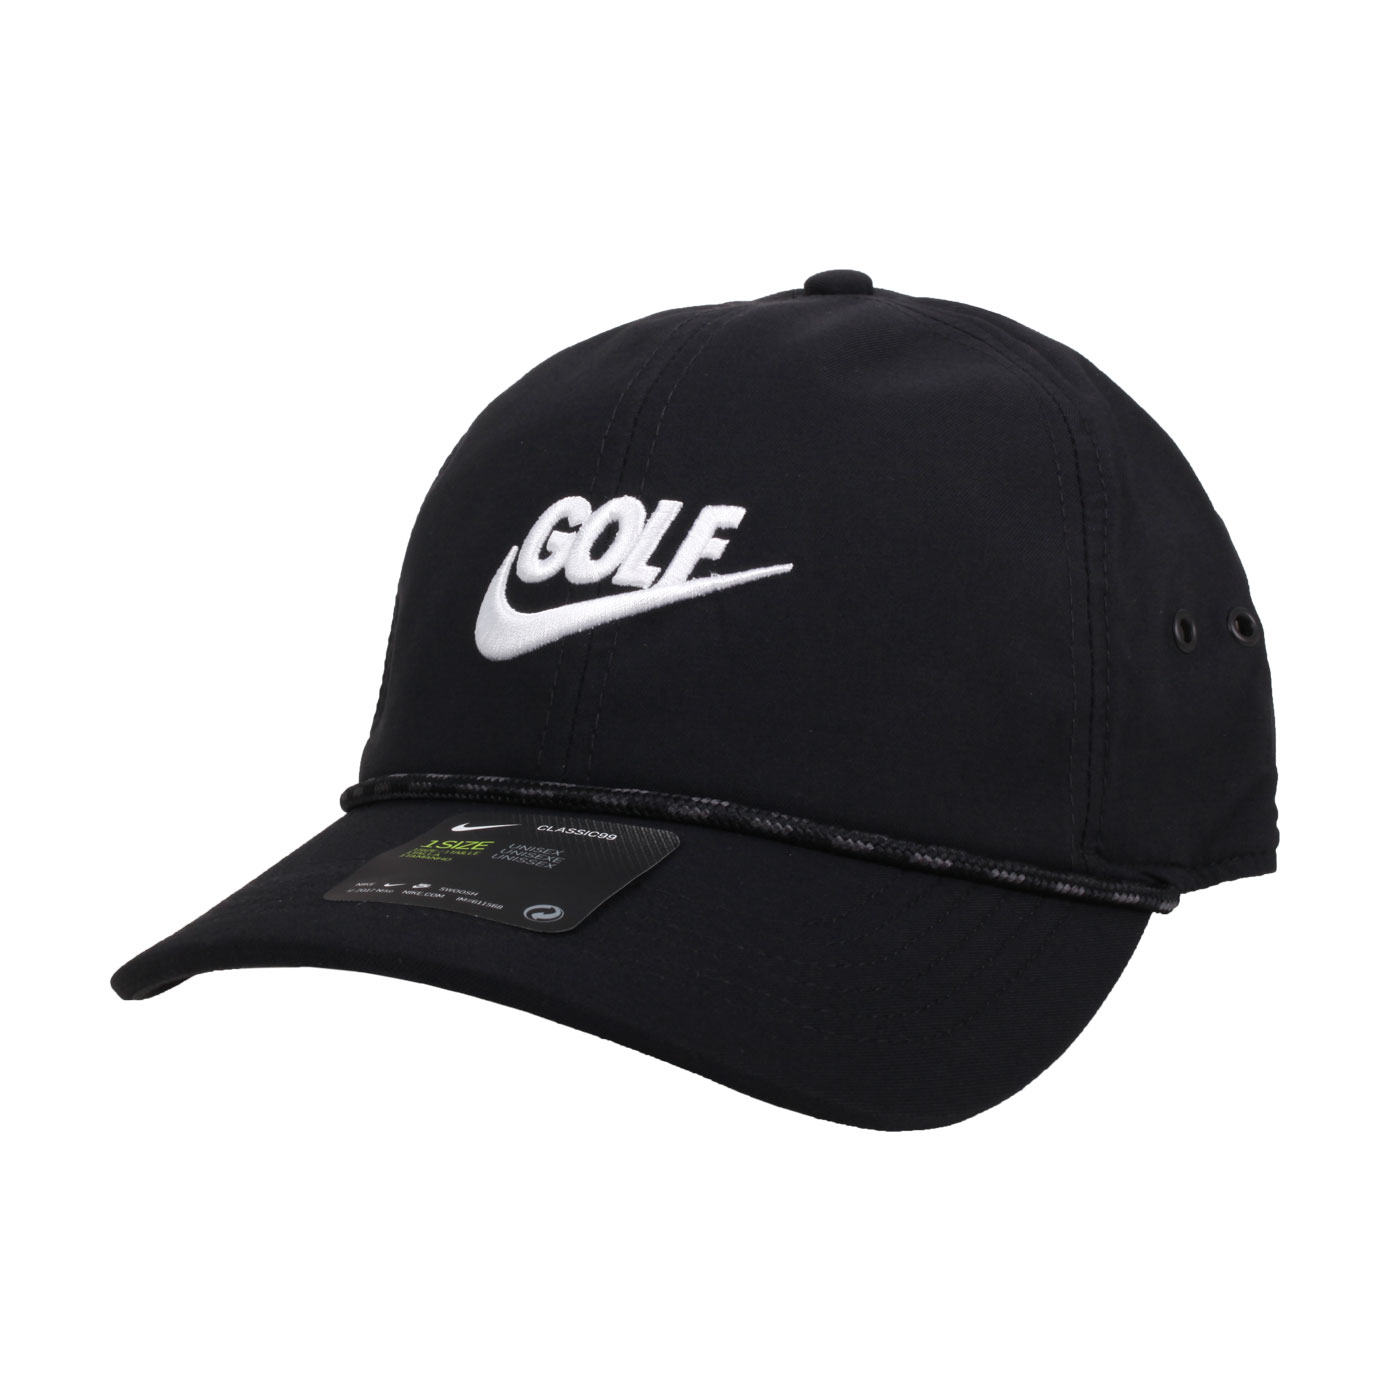 NIKE 高爾夫運動帽  GOLFBV8229-010 - 黑白